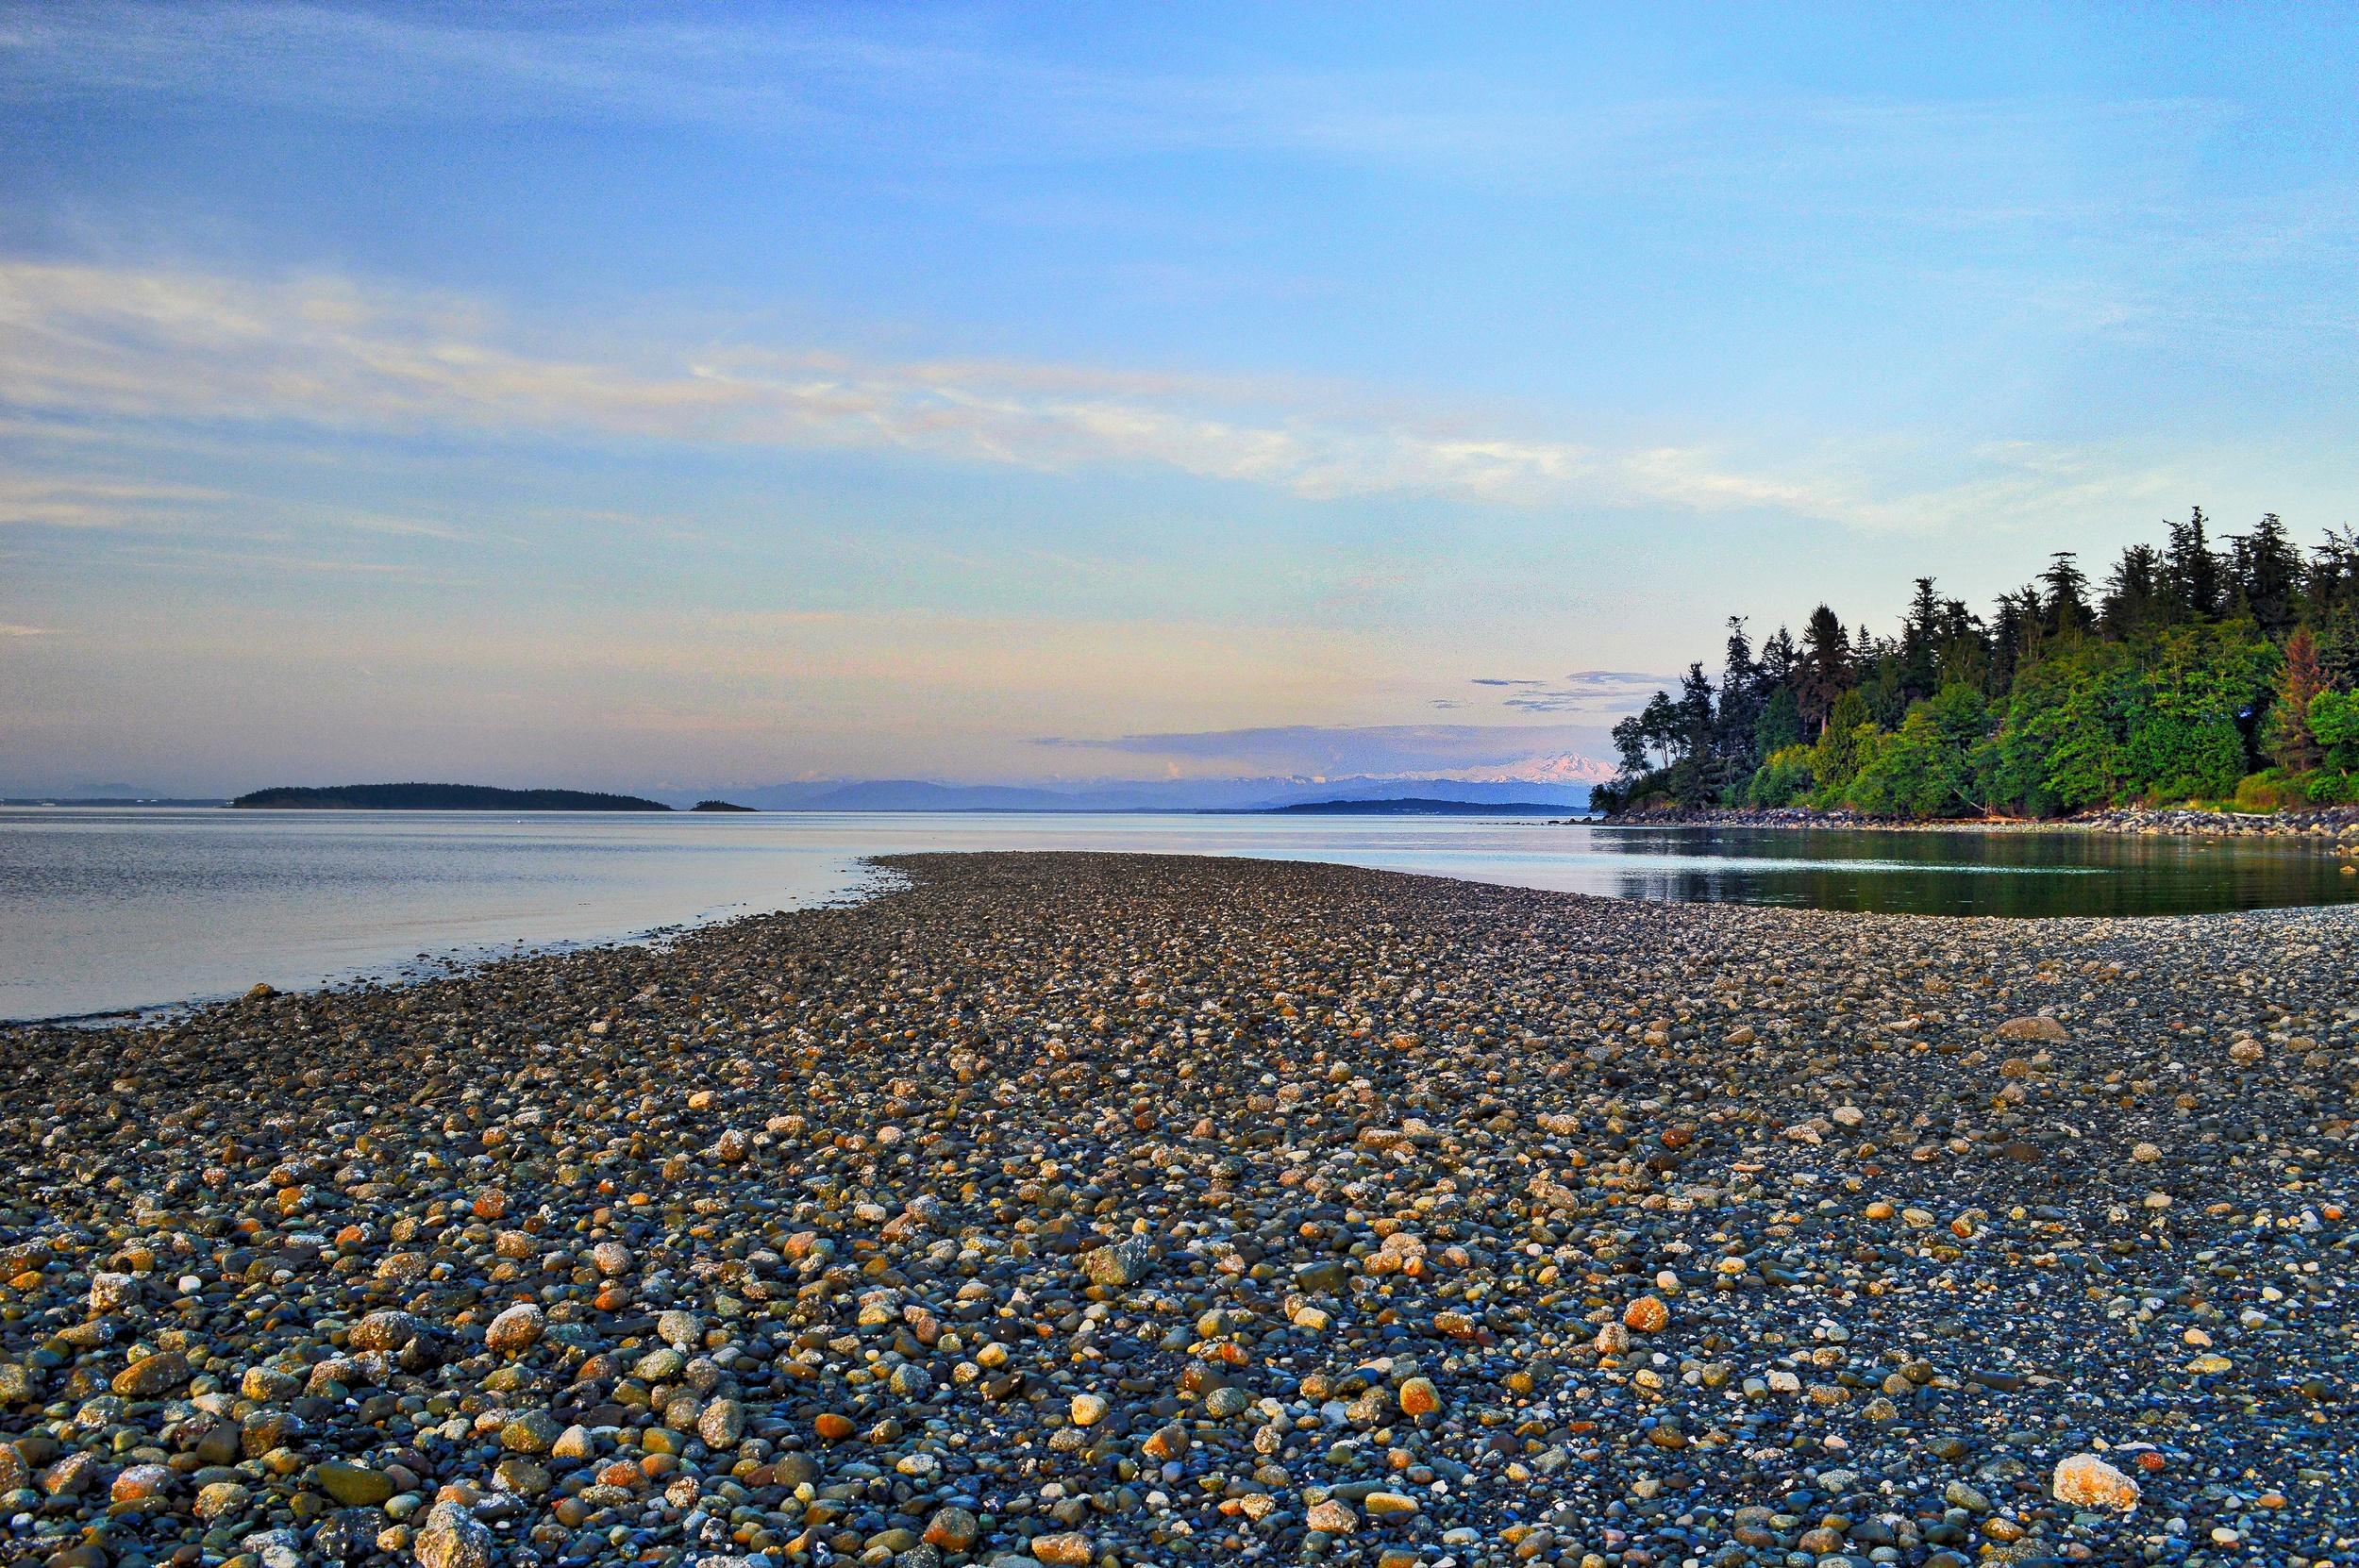 North Beach - Orcas Island, WA